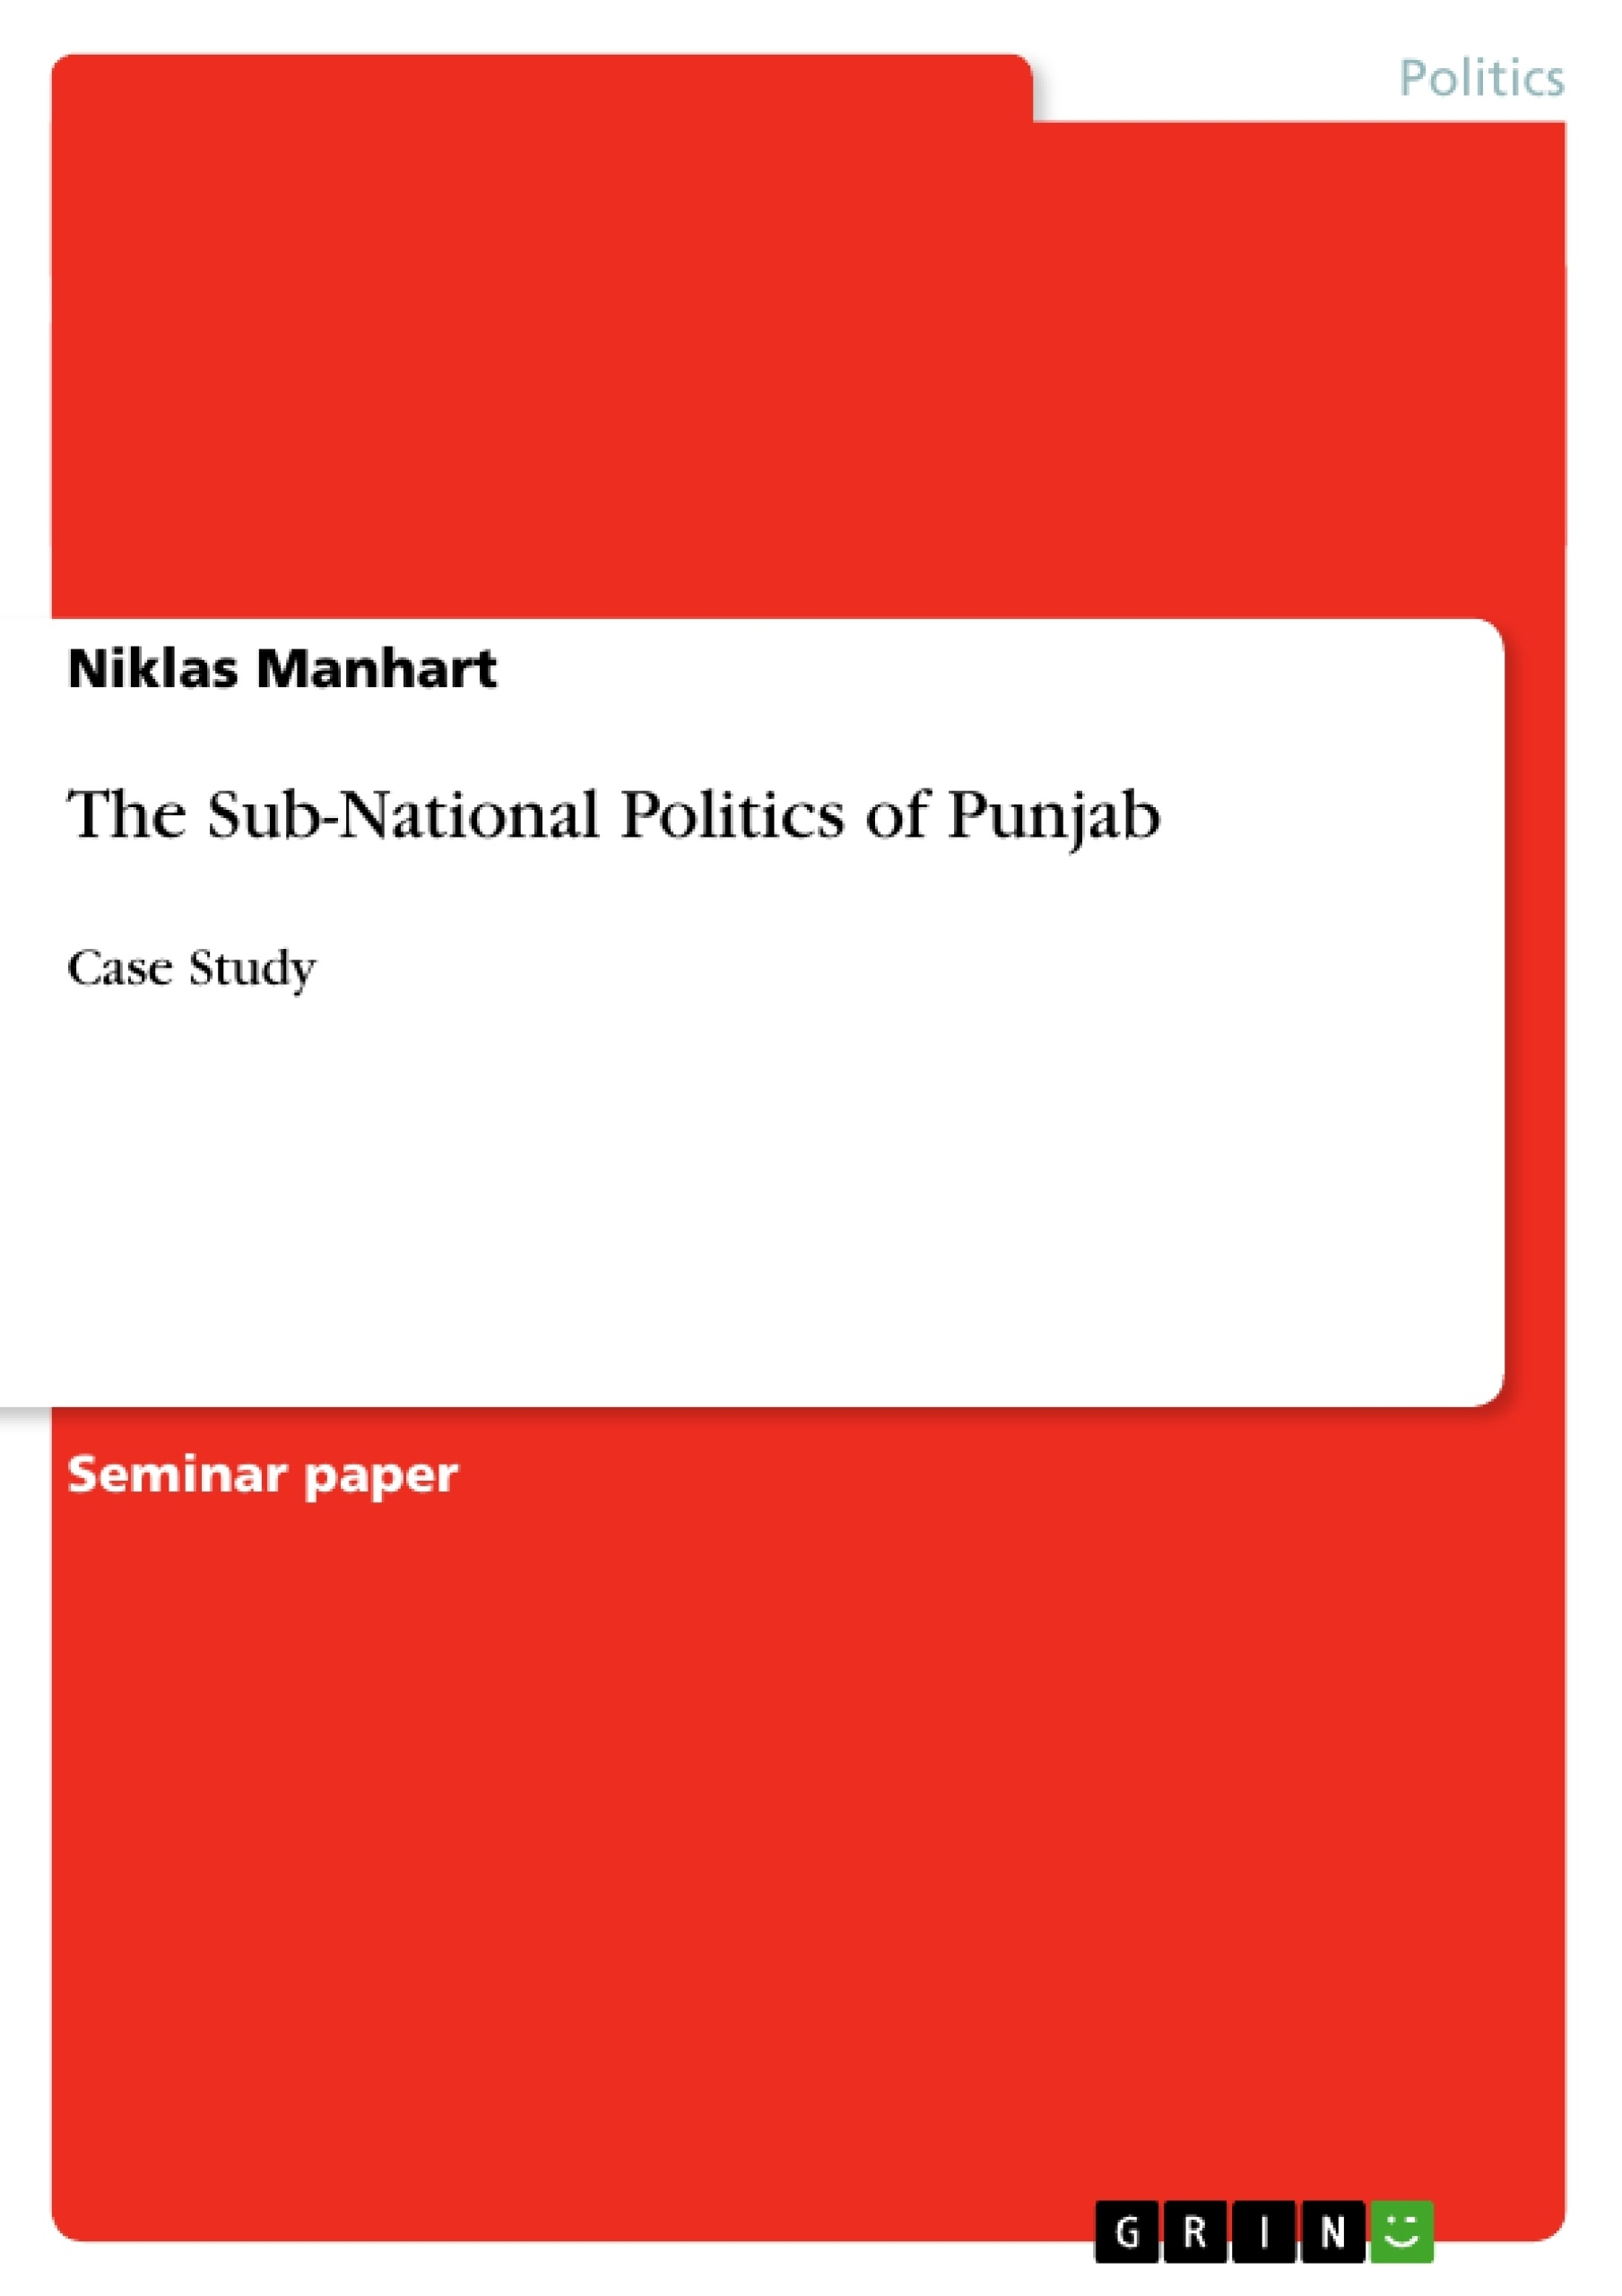 Title: The Sub-National Politics of Punjab